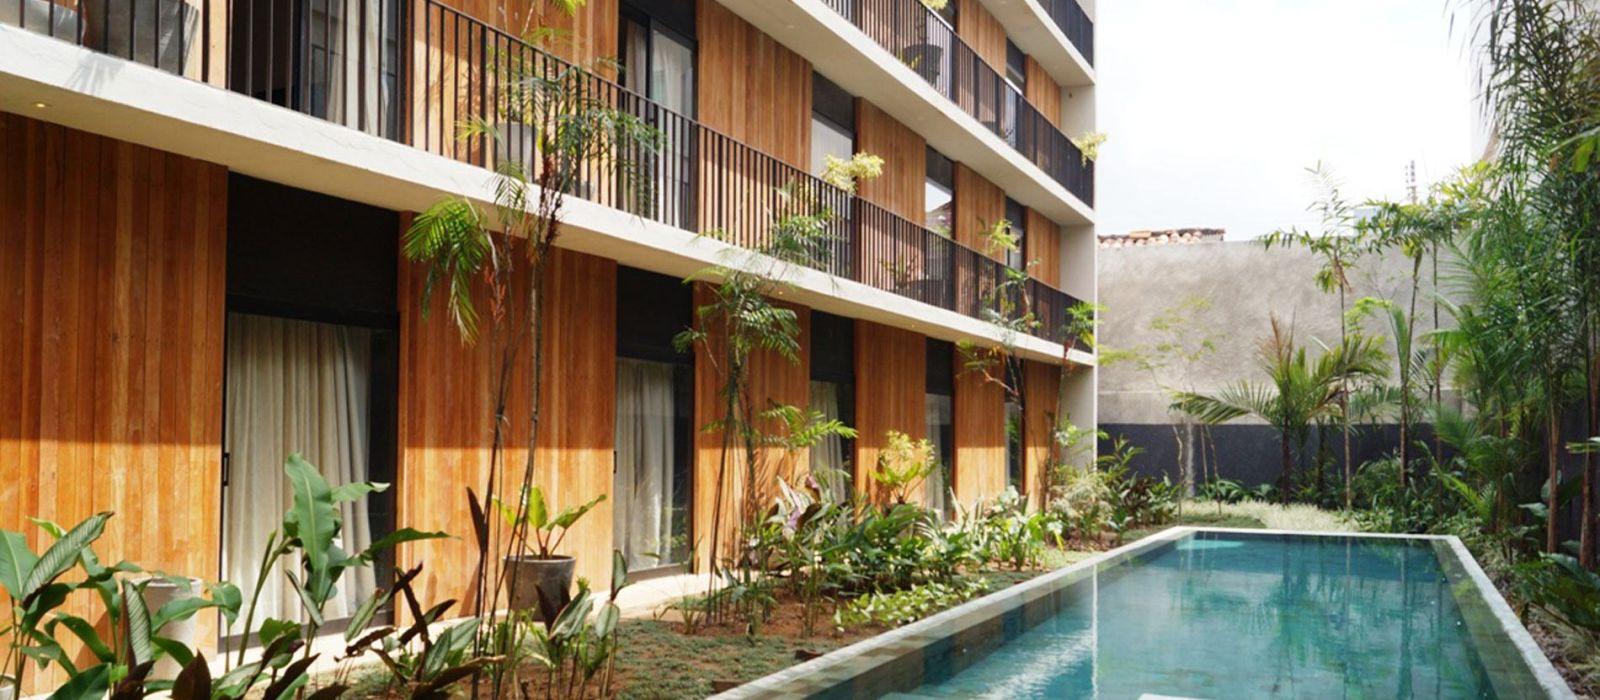 Hotel Villa Amazonia Brazil